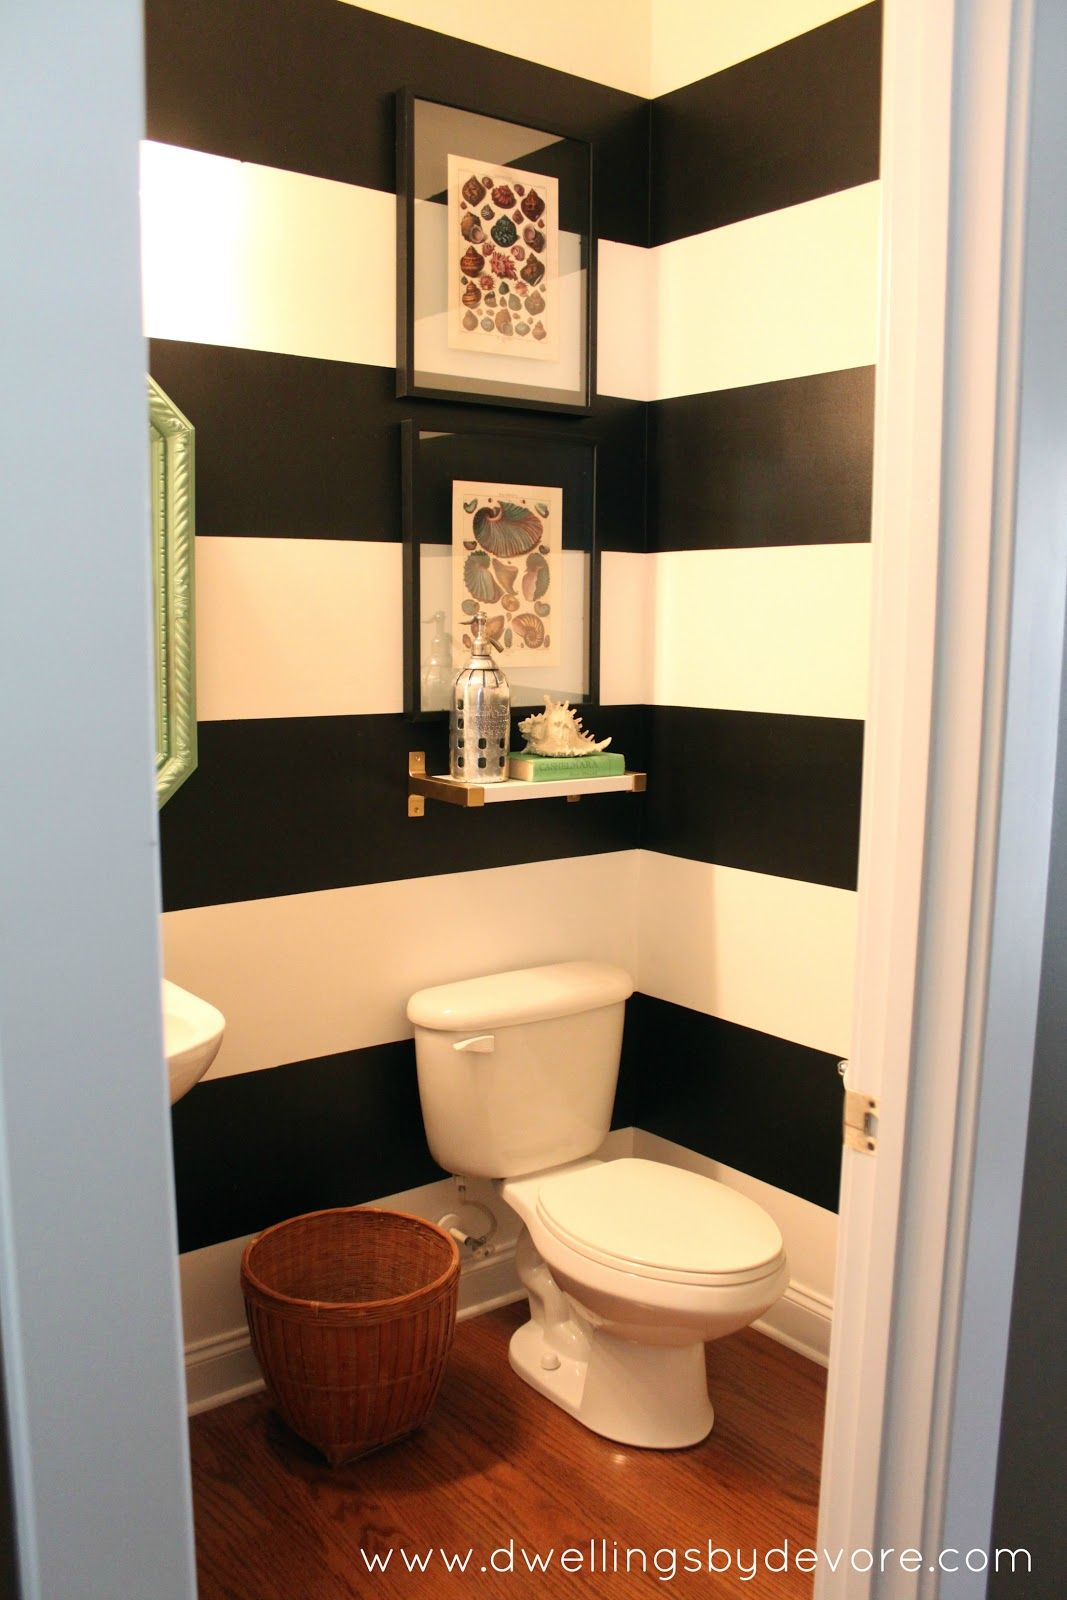 Dwellings By Devore Black And White Striped Bathroom Striped Bathroom Walls Striped Walls White Bathroom Designs